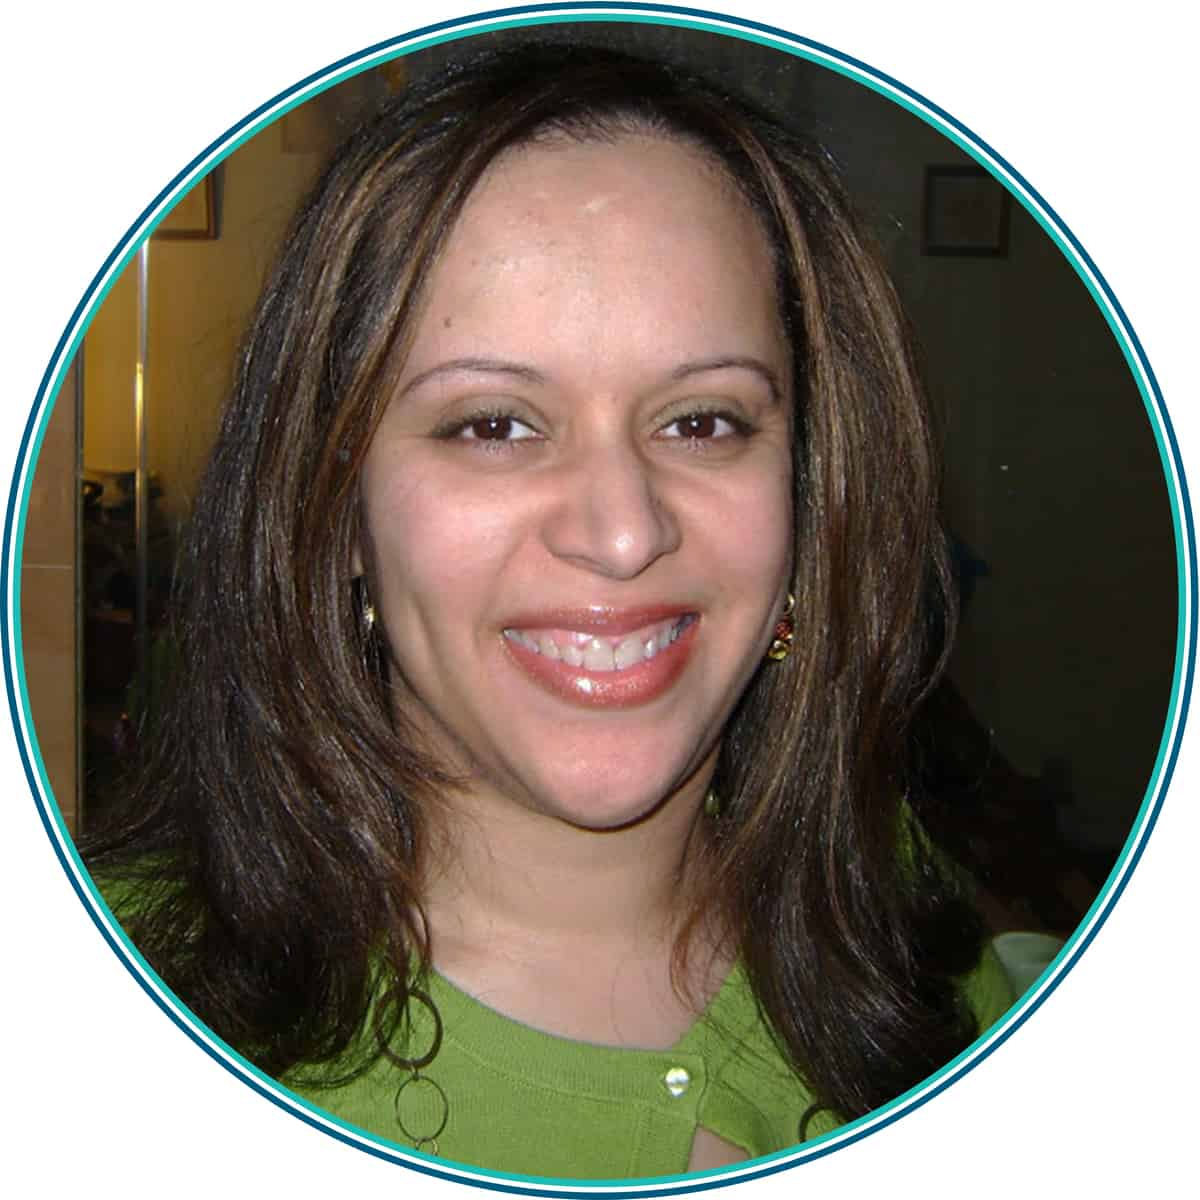 Headshot of Heather Watkins